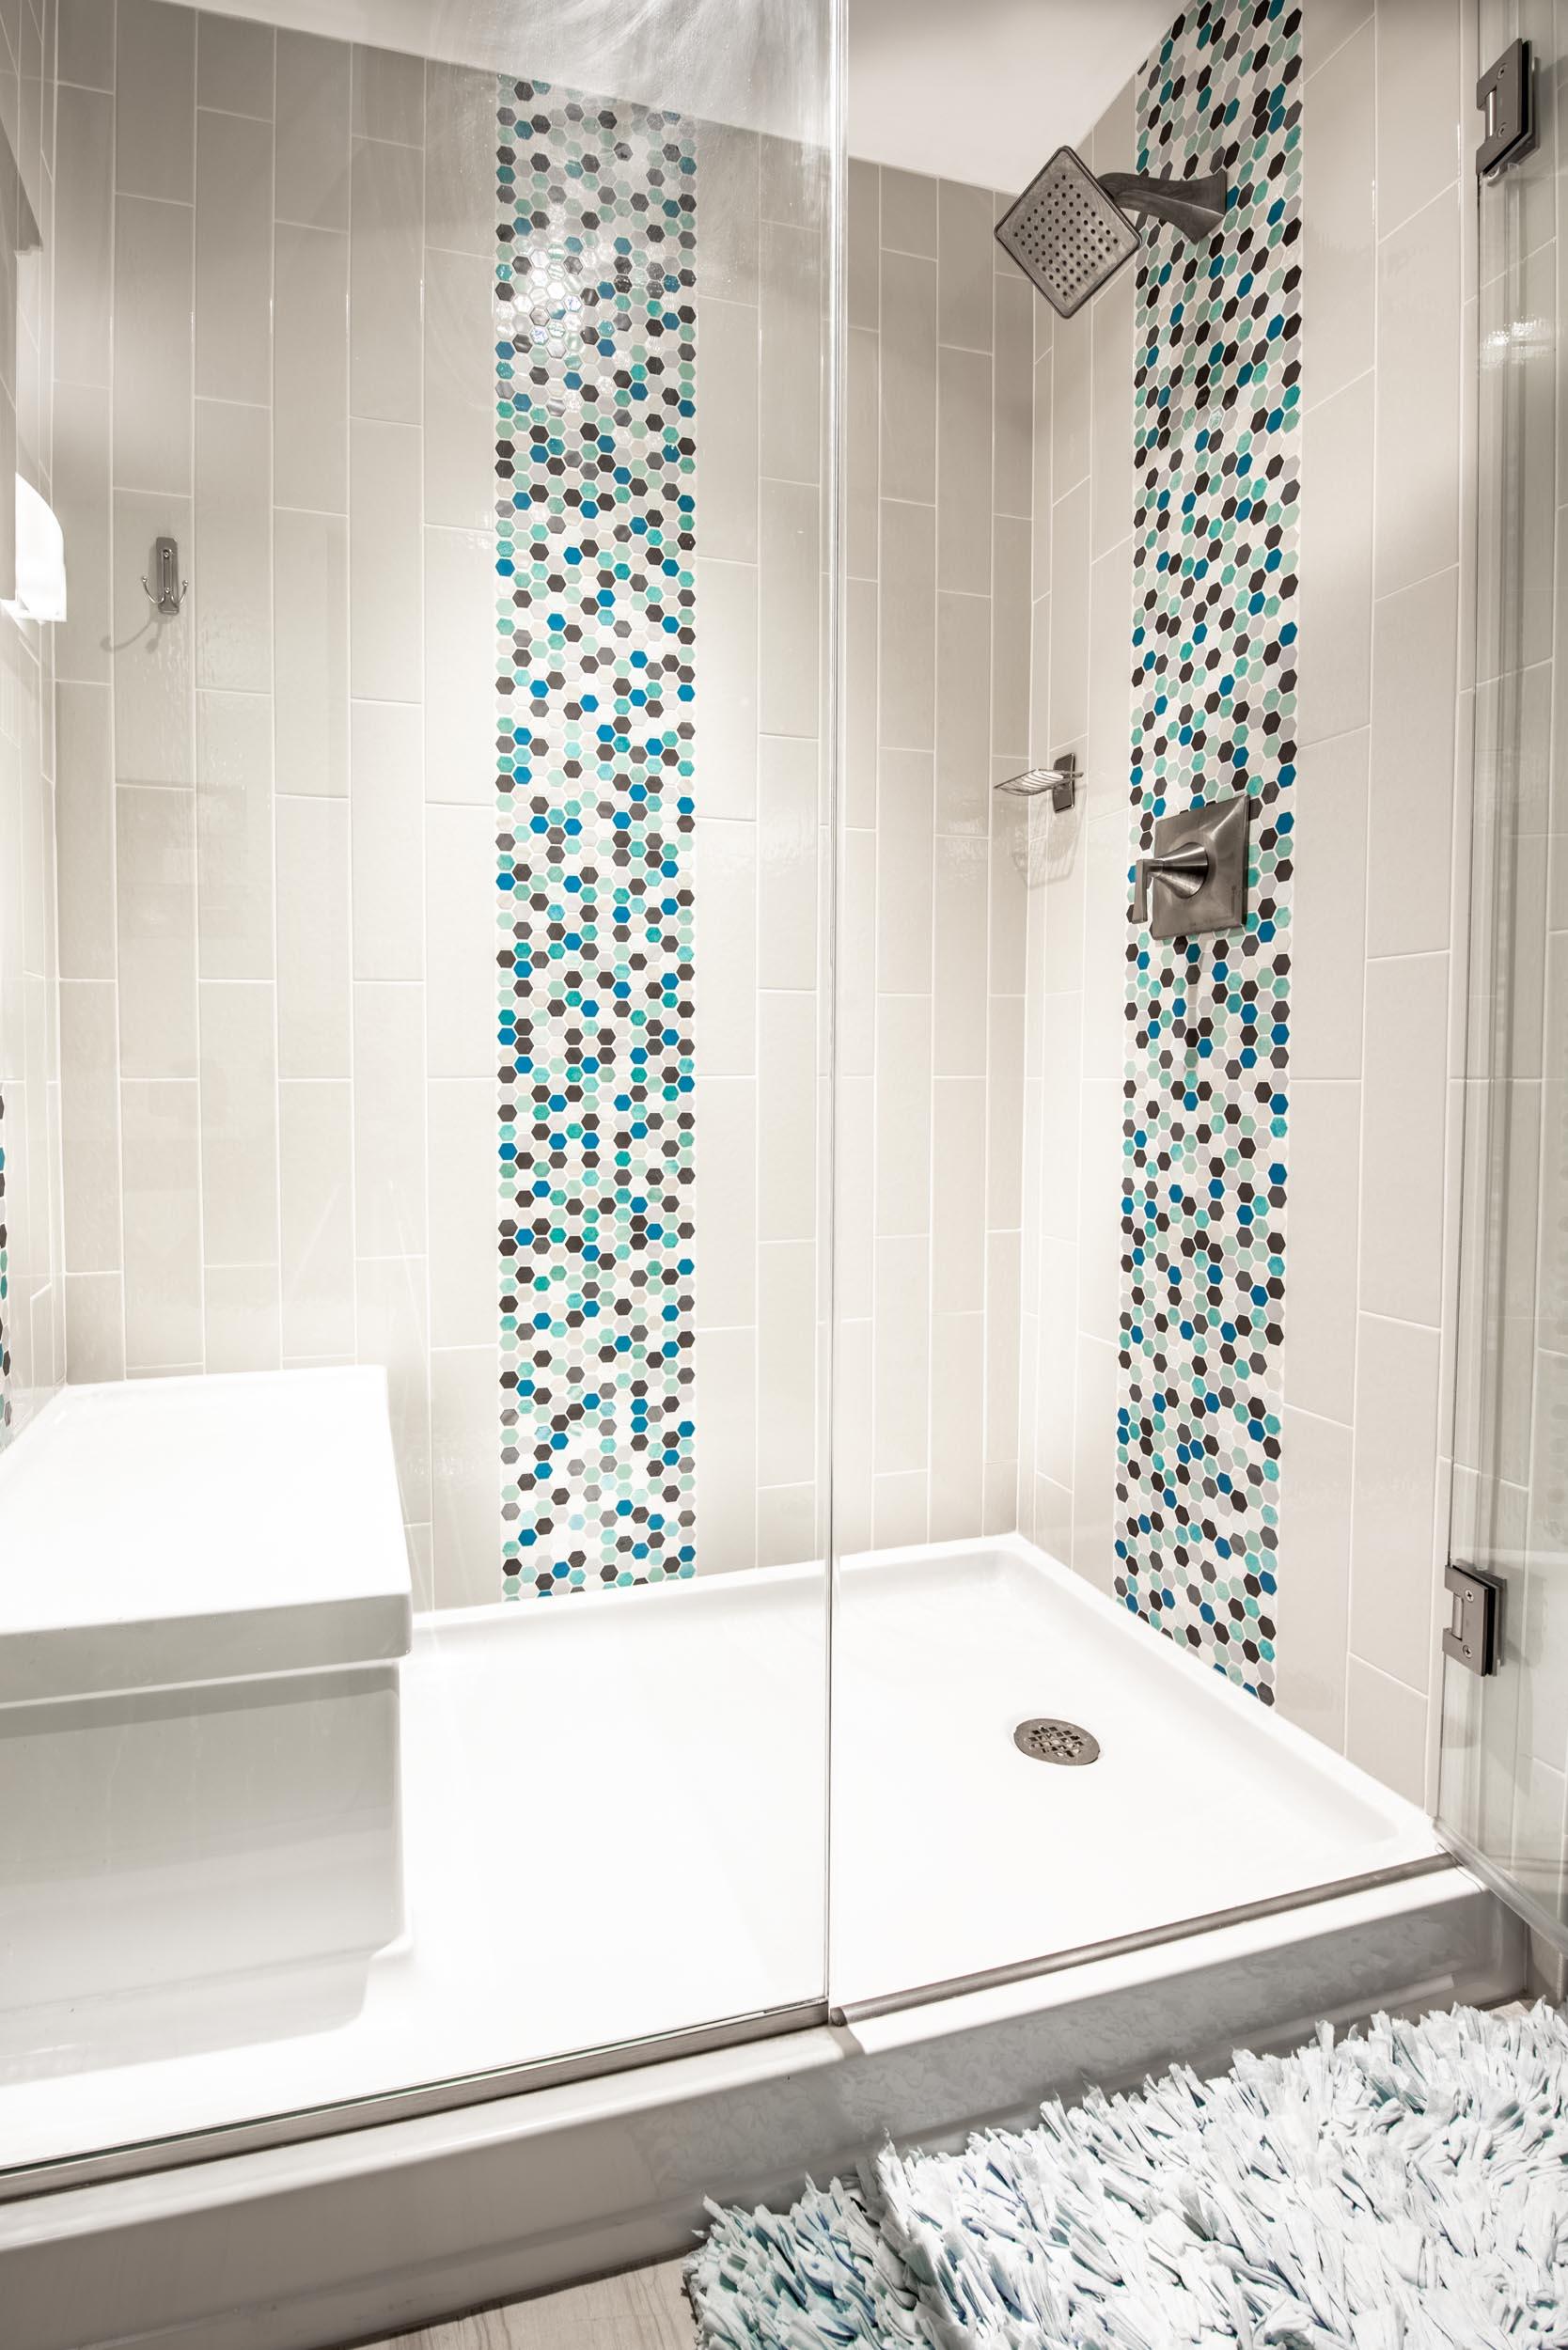 - This multi-colored mosaic provides a pop of color in this condominium bathroom.